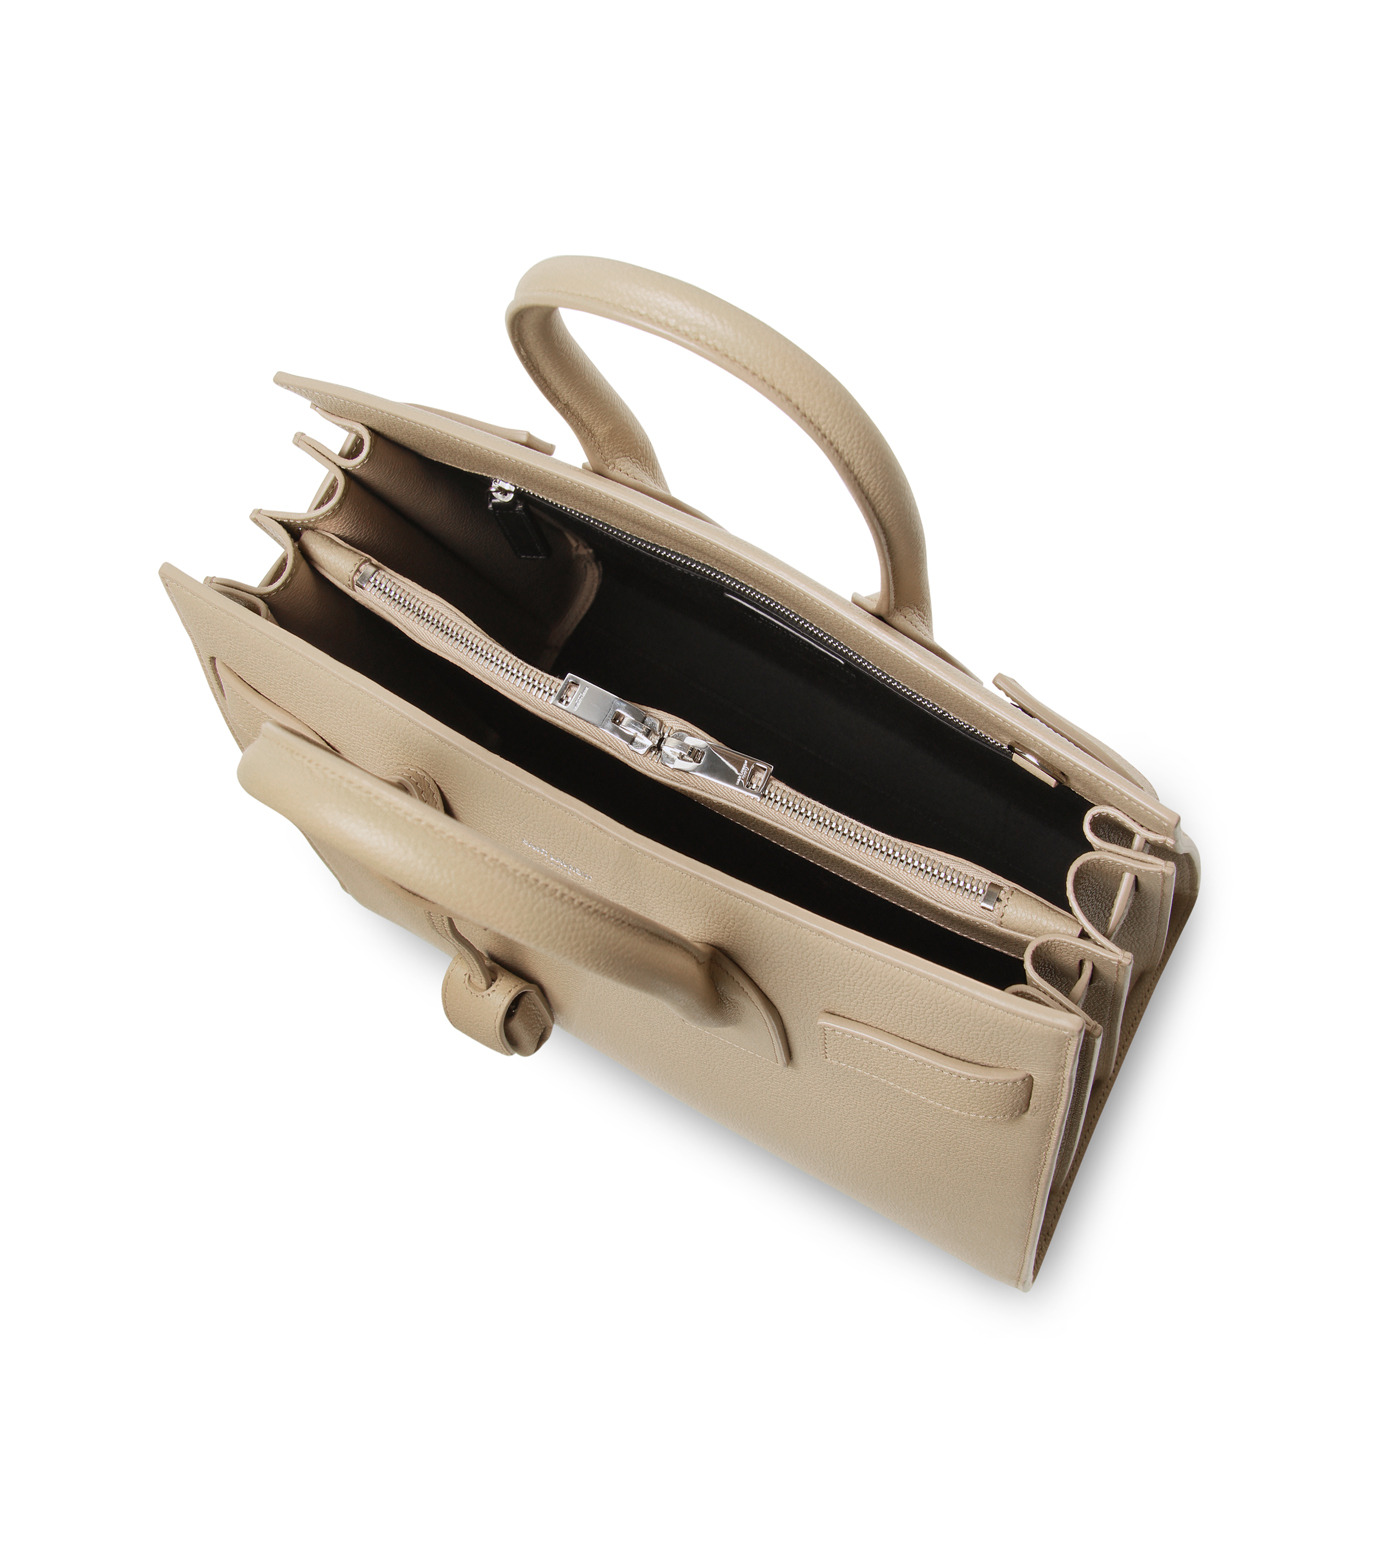 SAINT LAURENT(サンローラン)のSac de Jour Small-BEIGE(ハンドバッグ/hand bag)-398709-B680N-52 拡大詳細画像4